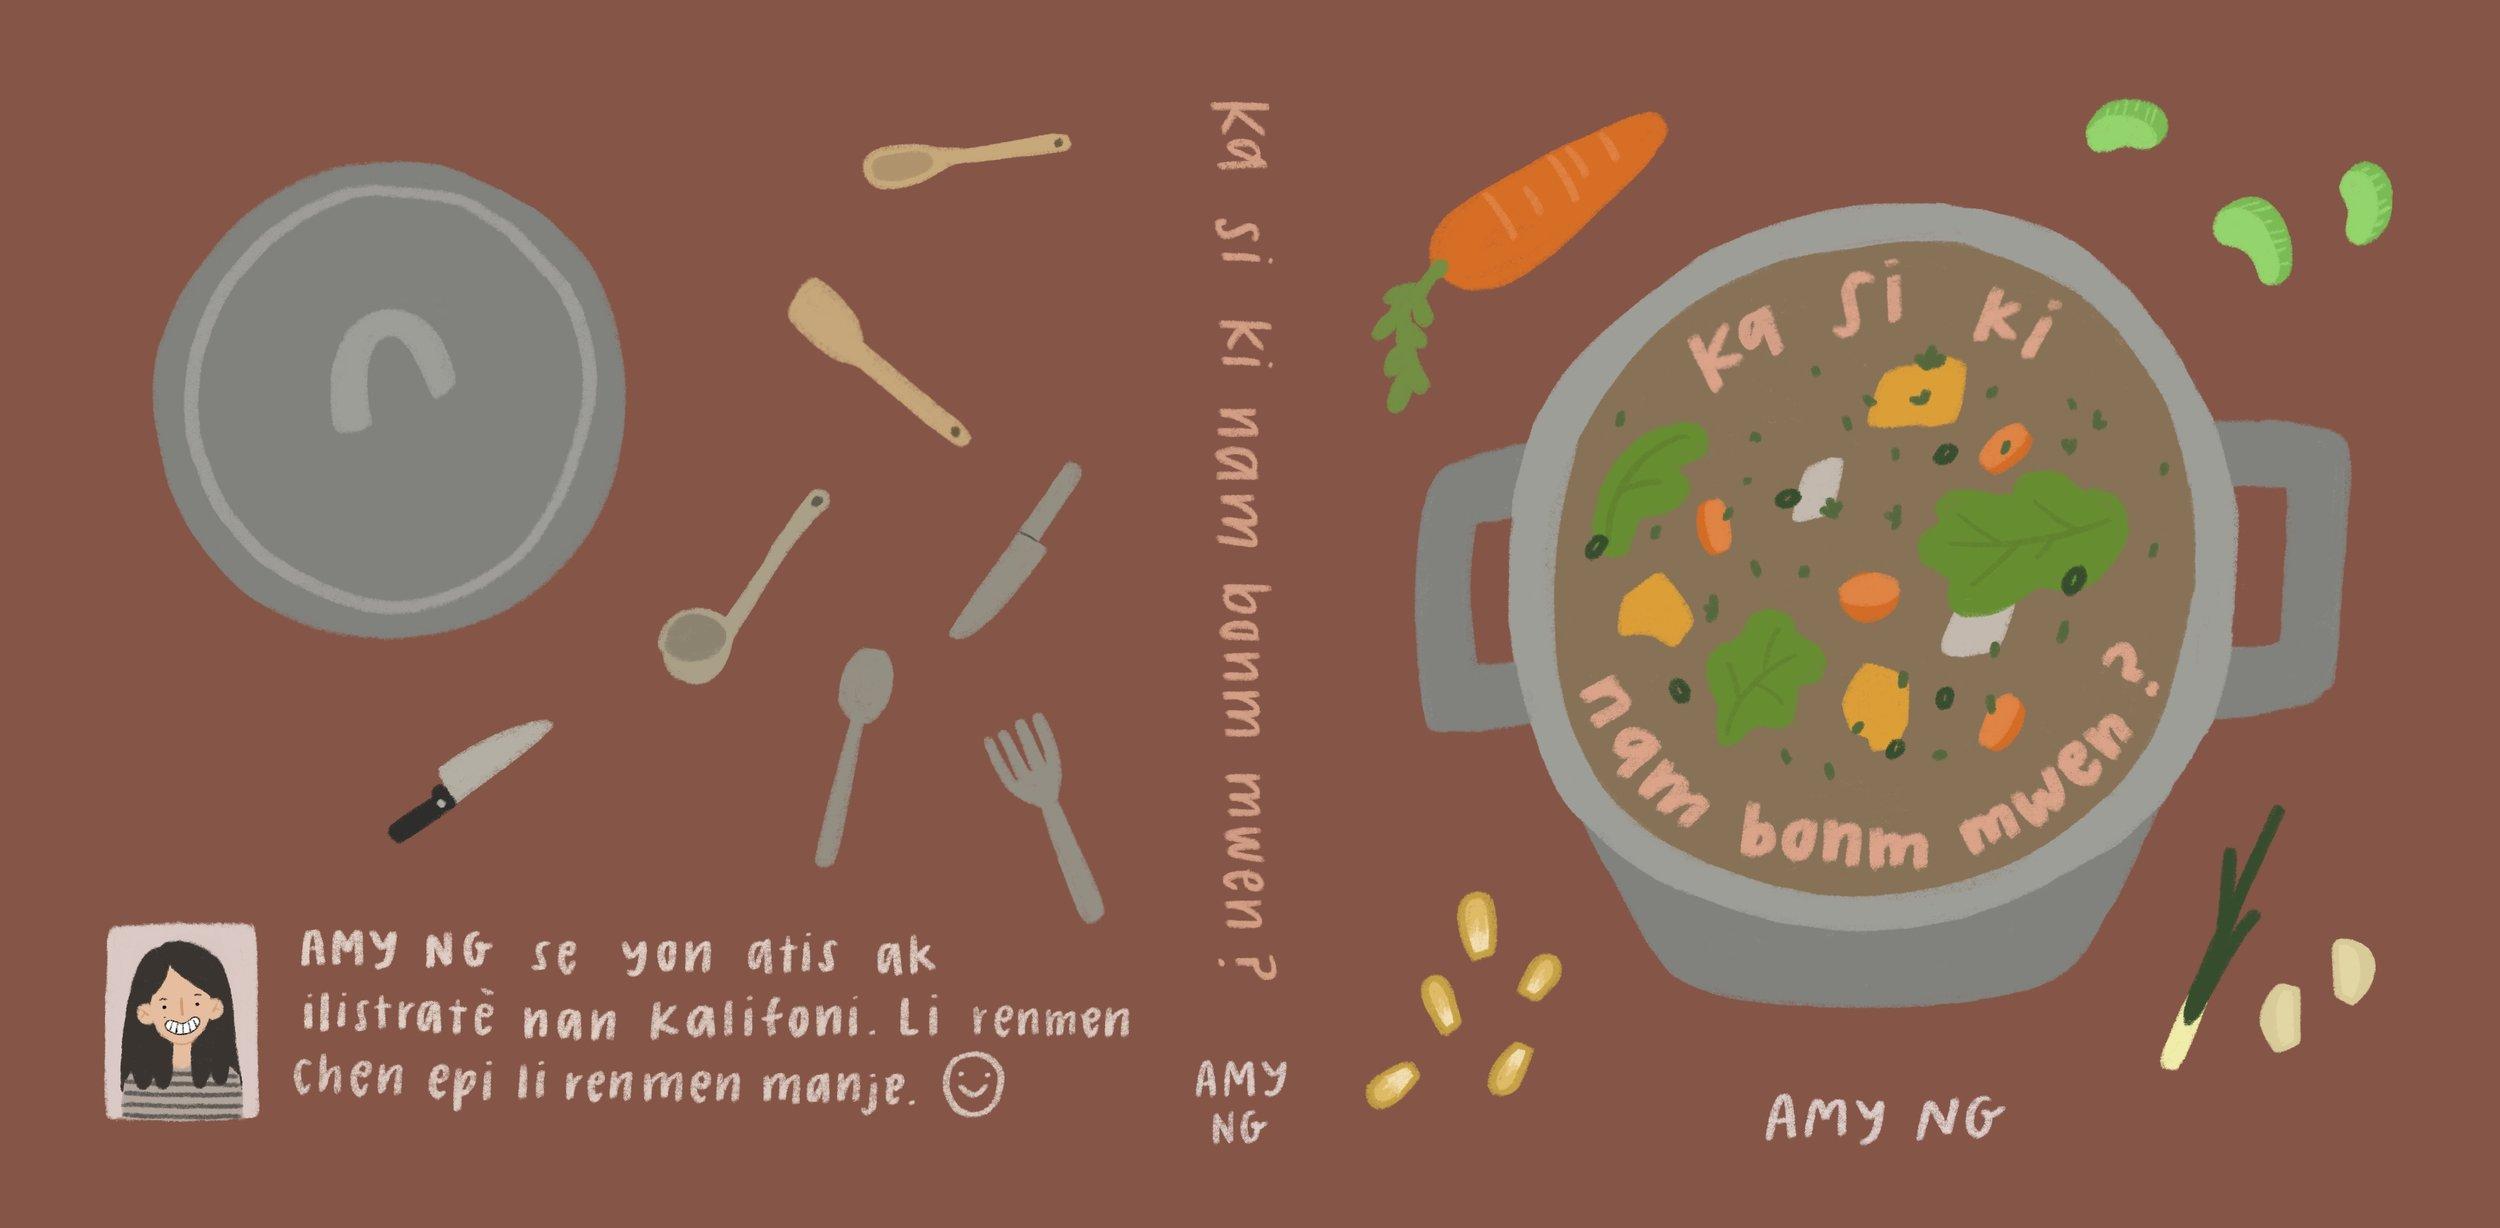 Ka si ki nam bonm mwen ? (What's in My Pot?)  by Amy Ng